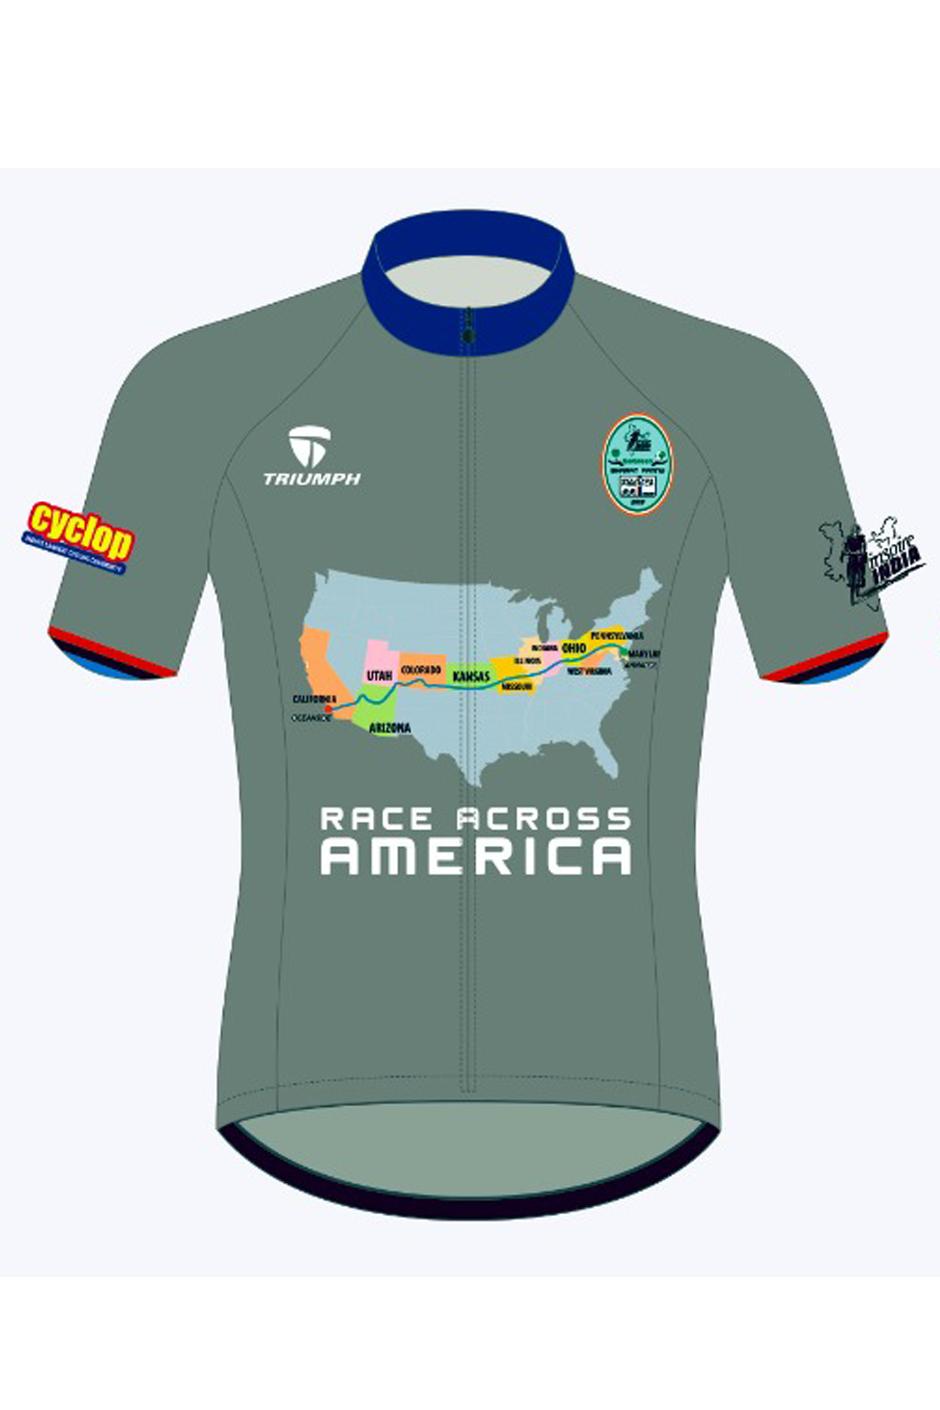 58e383ecd0b Half sleeve soccer jersey ₹599.00